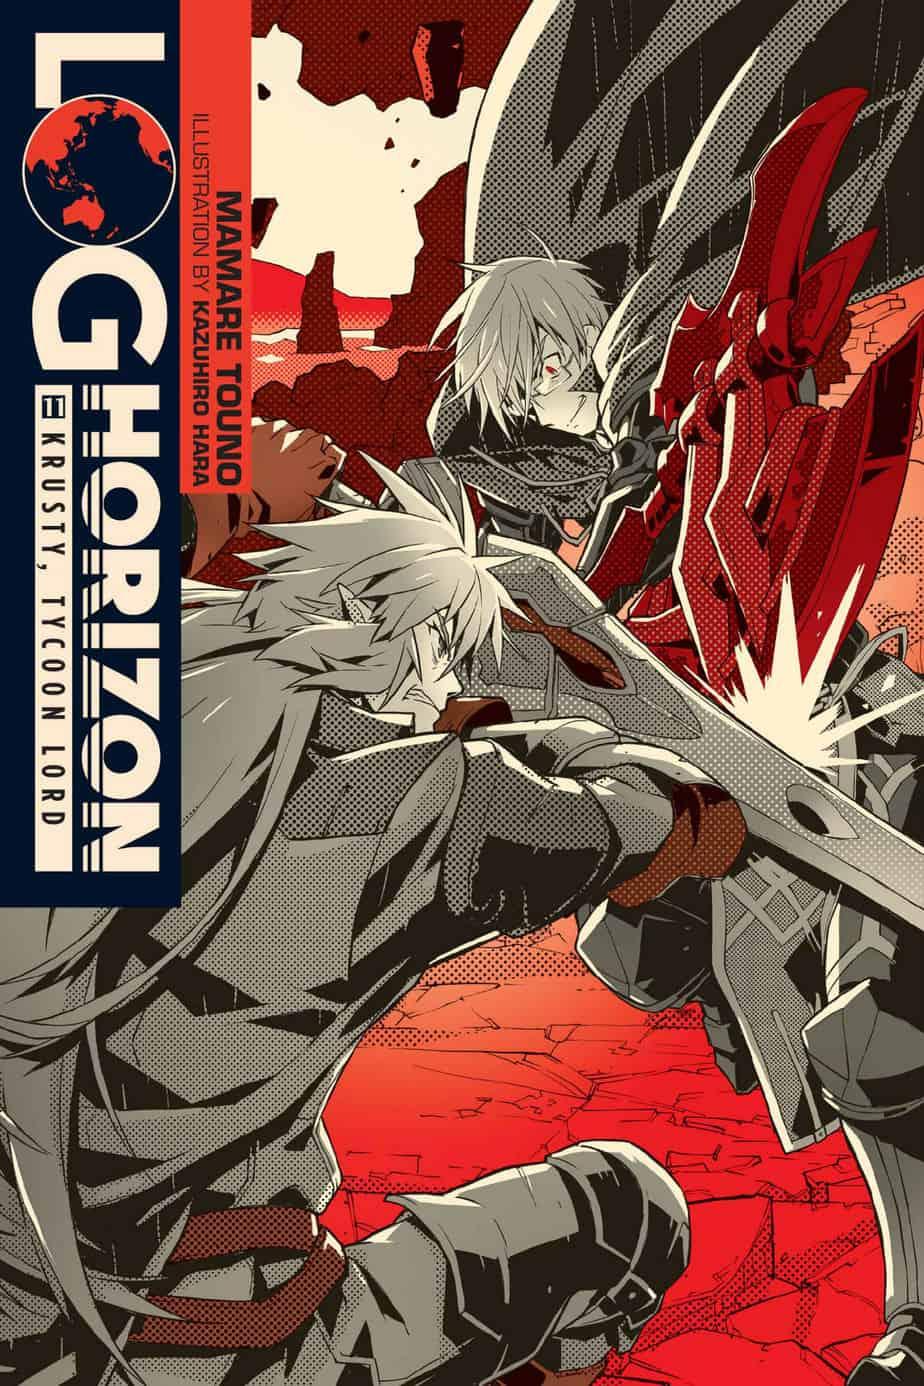 Log Horizon Volume 11 Light Novel Cover Art Krusty Tycoon Lord